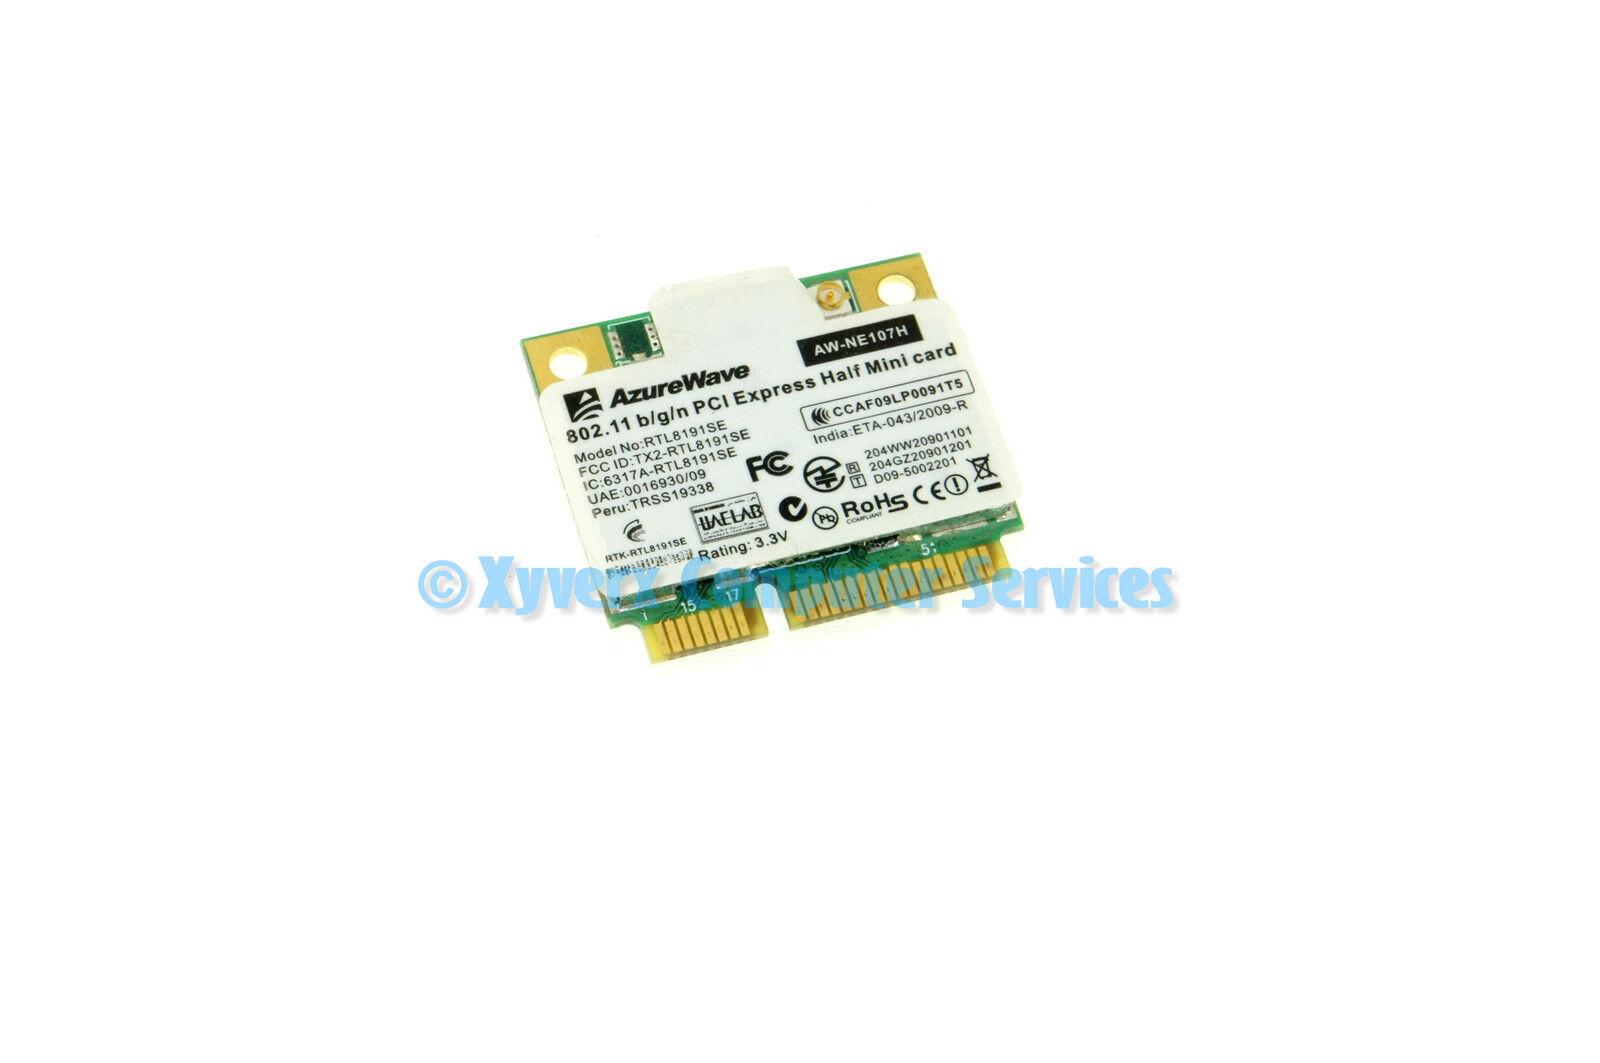 AW-NE107 WIRELESS LAN WINDOWS 8 X64 TREIBER